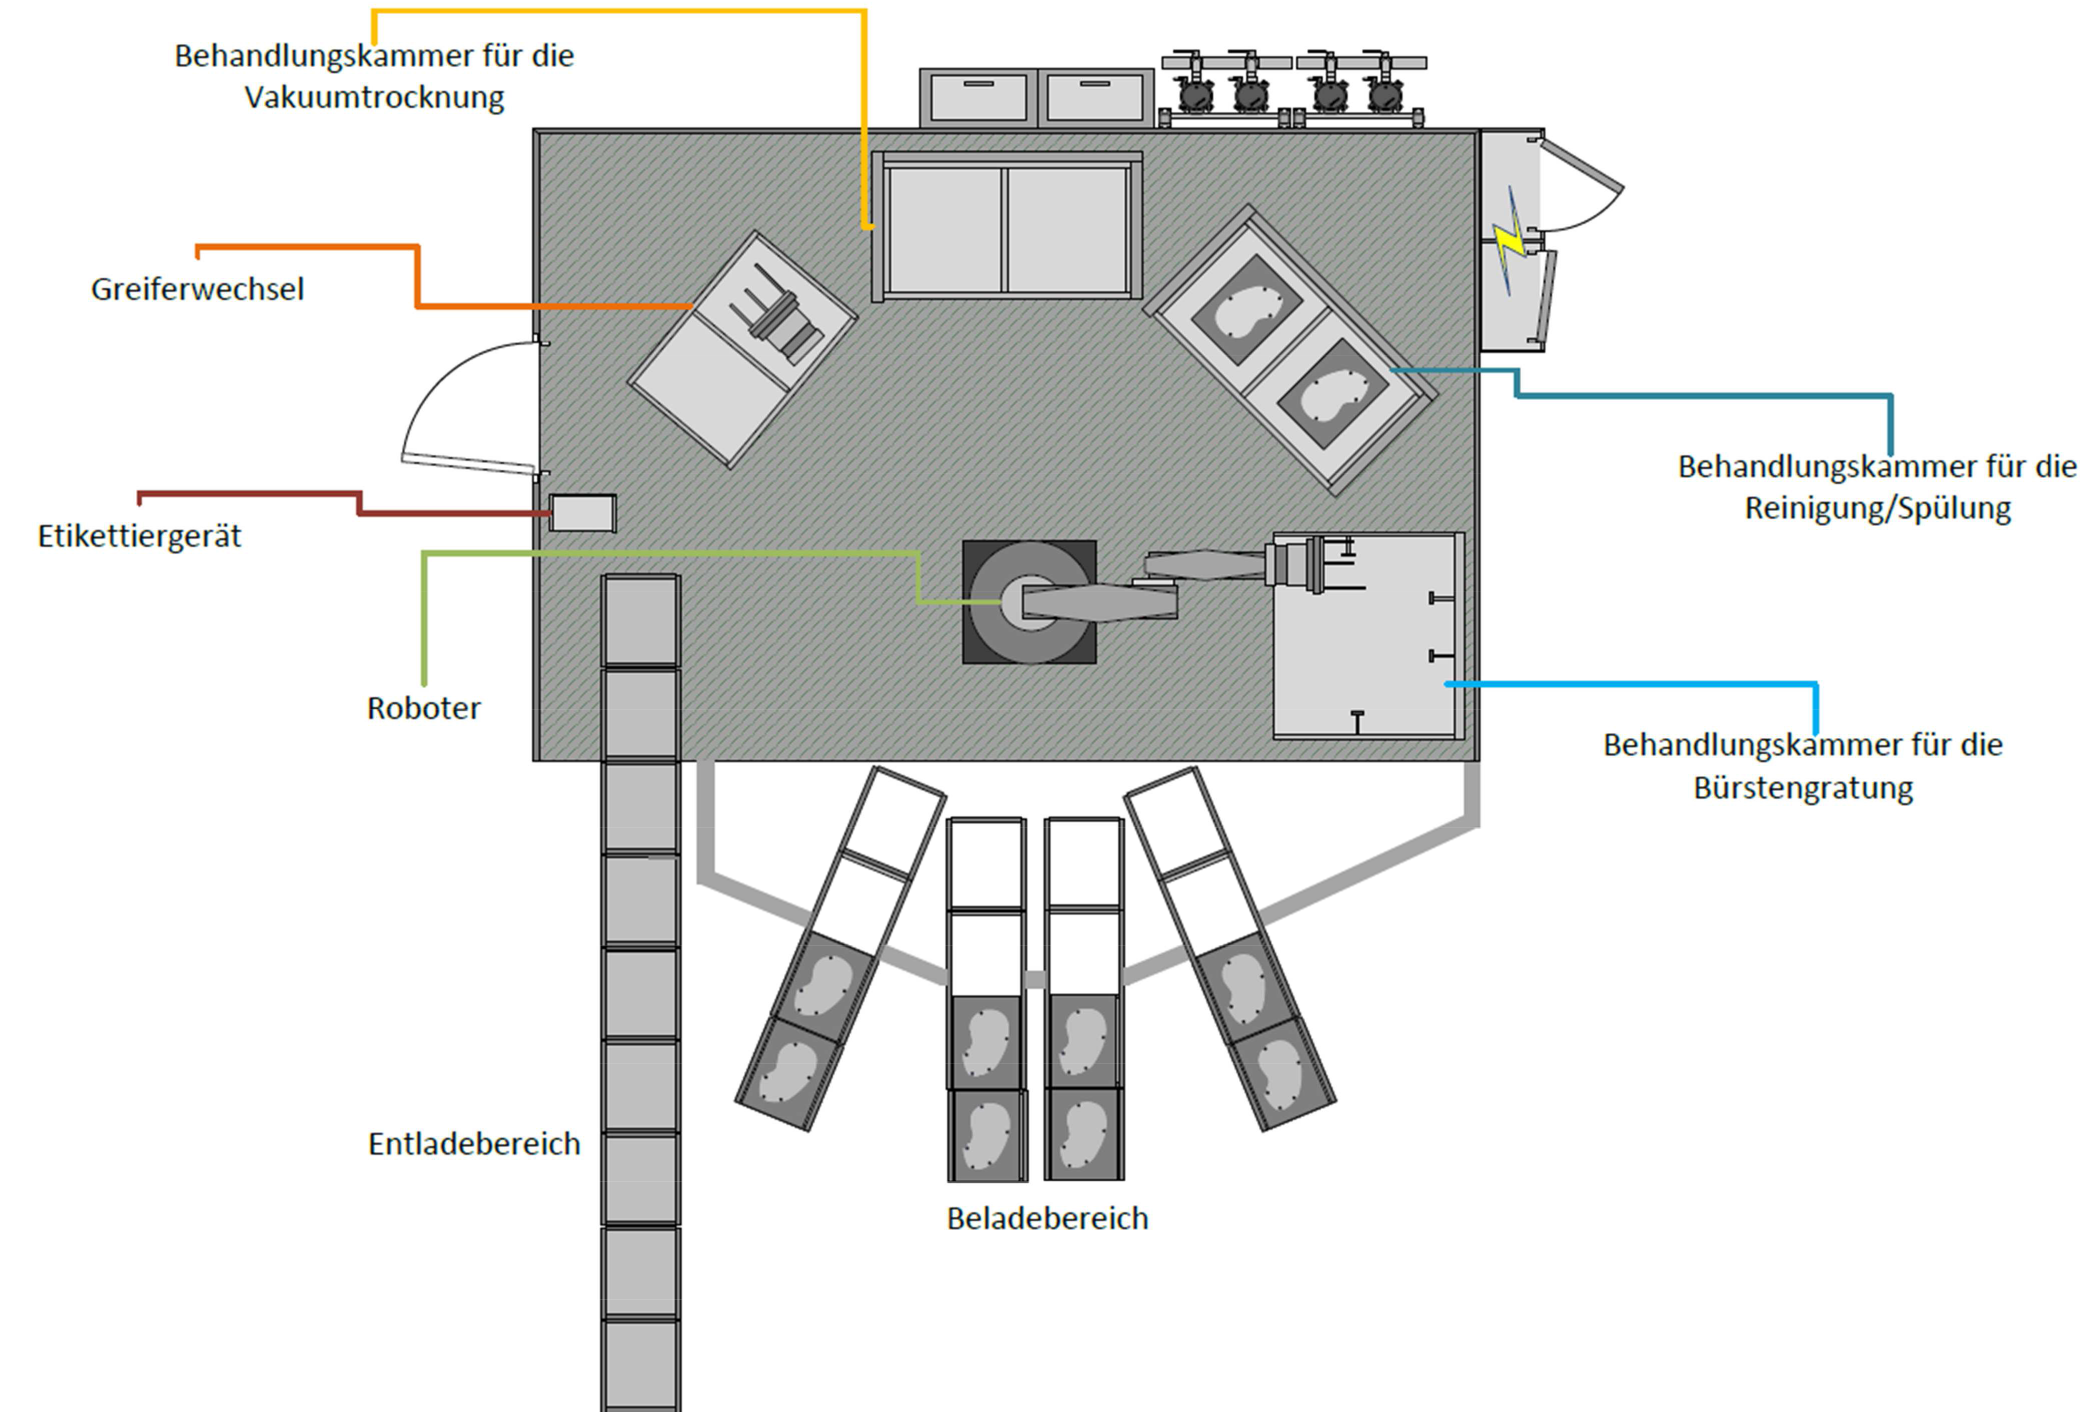 EB_Flyer-RoboFlex-Beschreibung